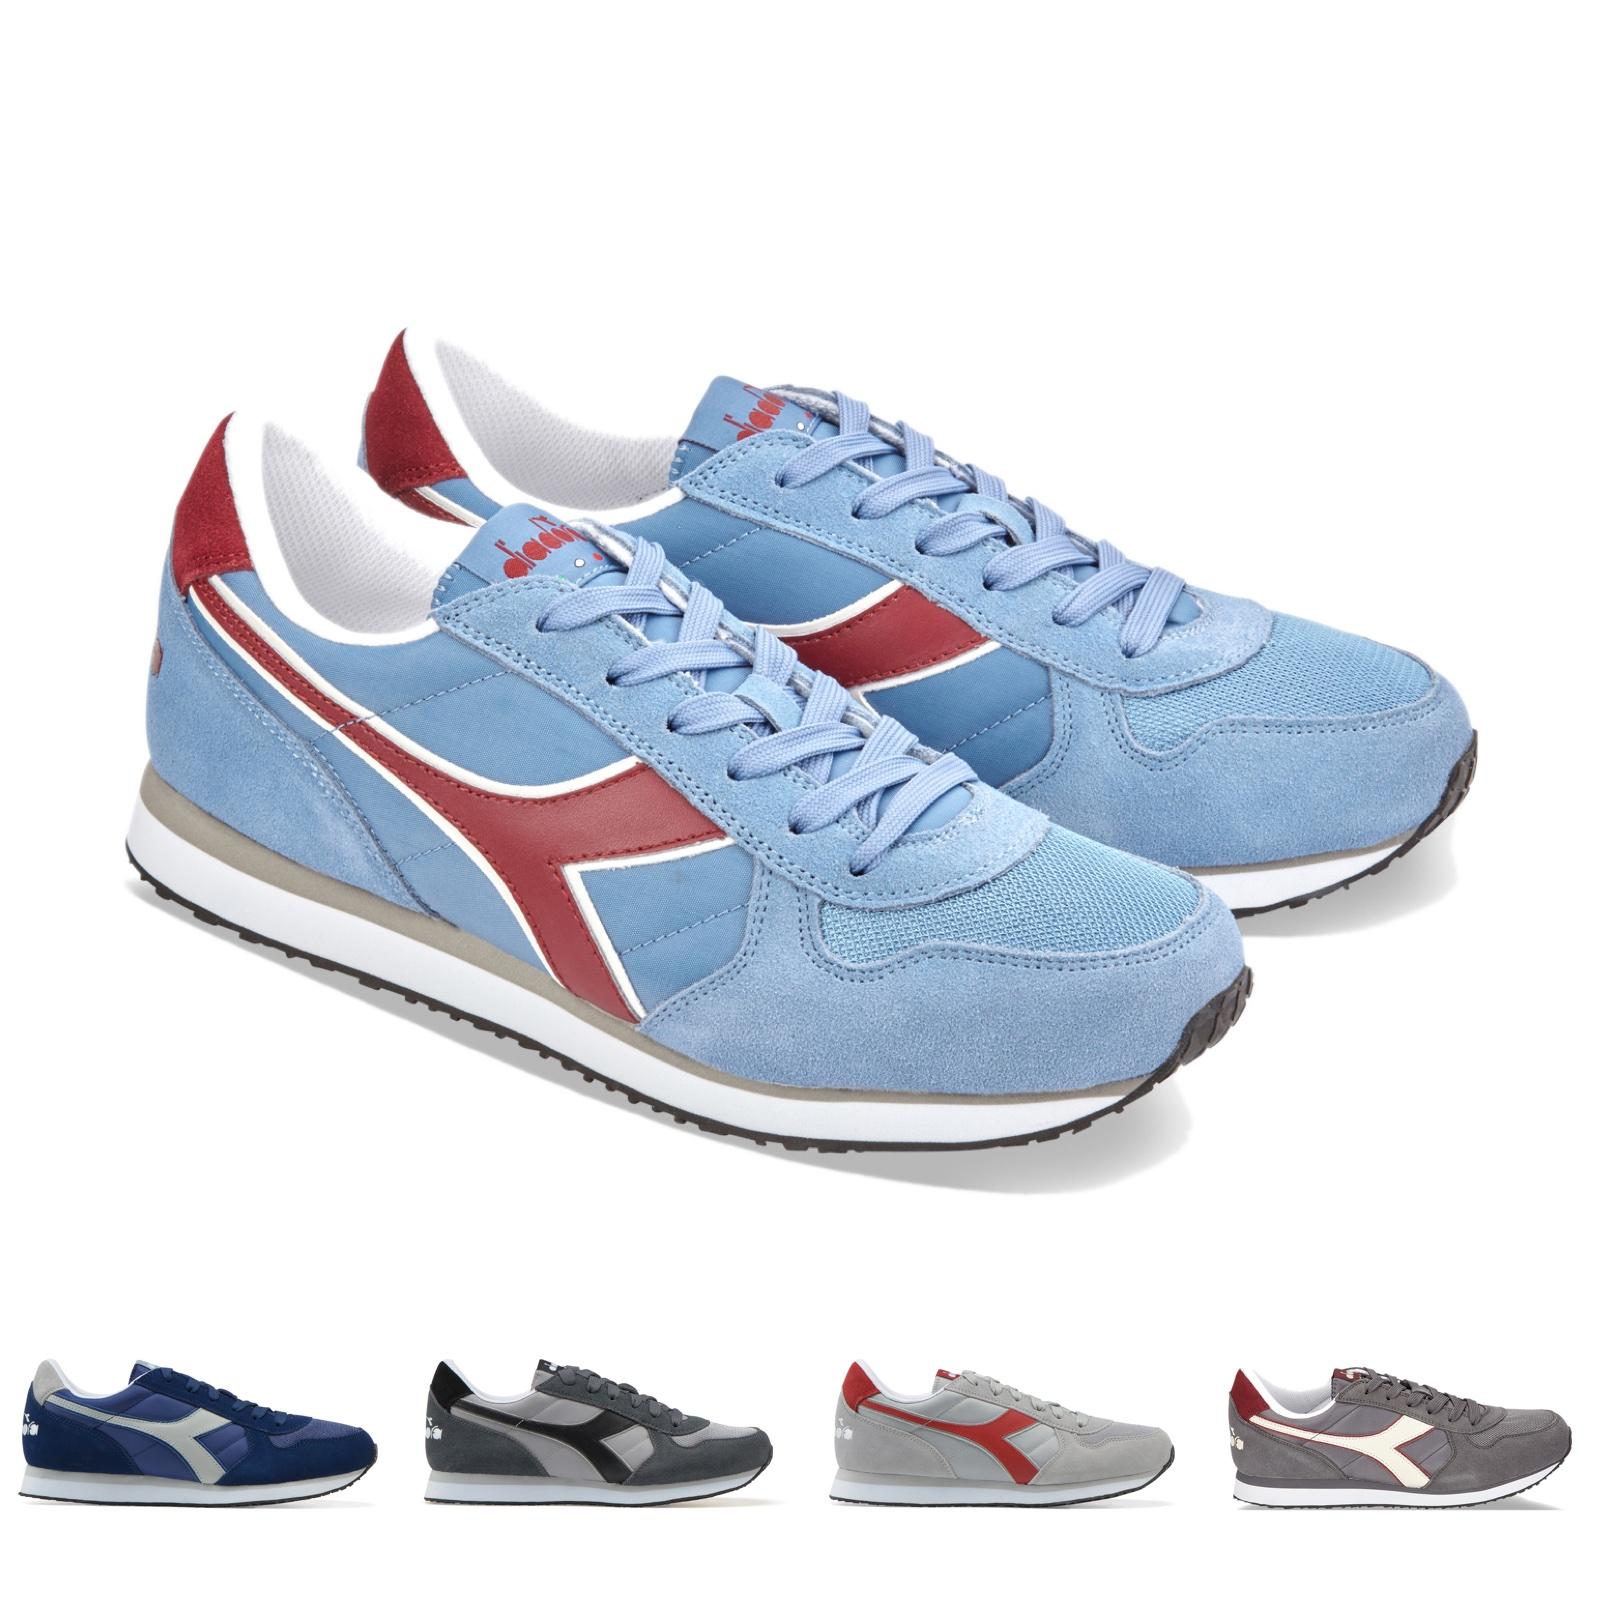 DIADORA K RUN II scarpe sportive uomo casual ginnastica